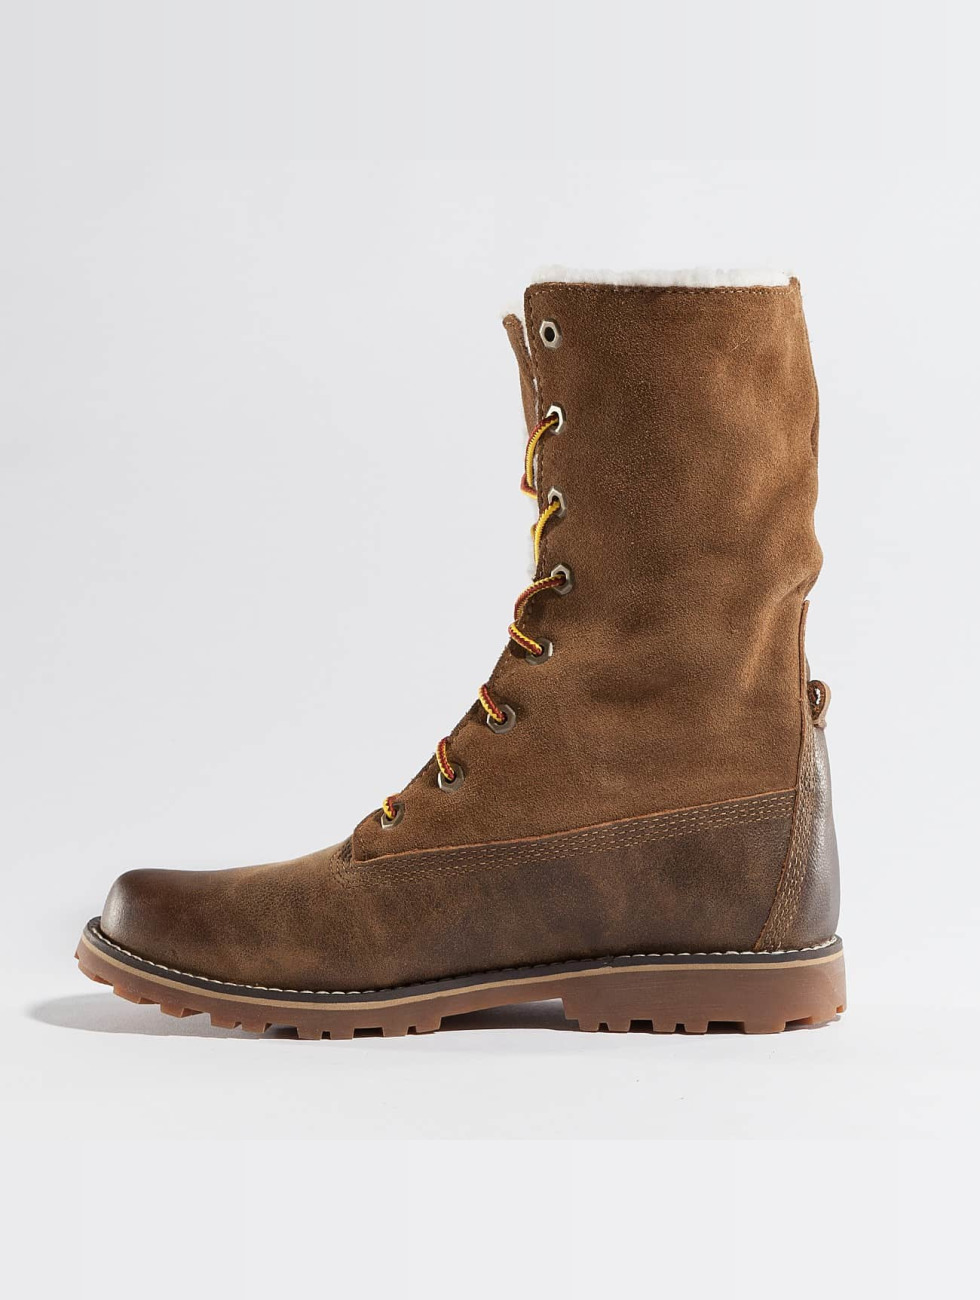 Timberland schoen / Boots 6 In Waterproof Shearling in bruin 367670 Kopen Goedkope Warm Te Koop Goedkope Koop Levering cdJ9G5z